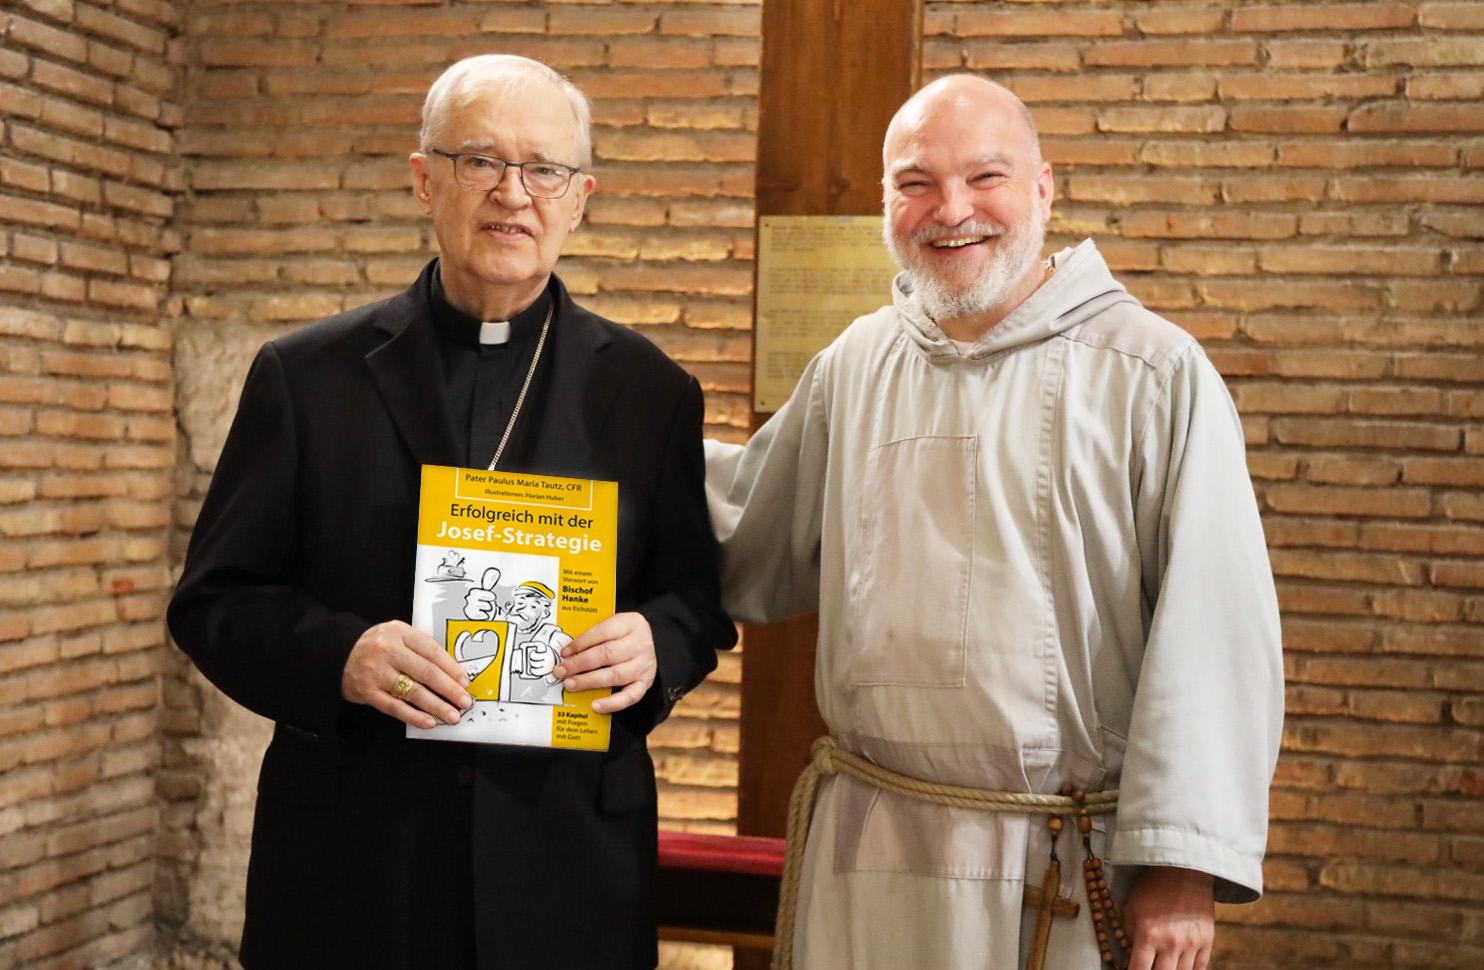 Buchvorstellung in Rom bei Kardinal Paul Josef Cordes